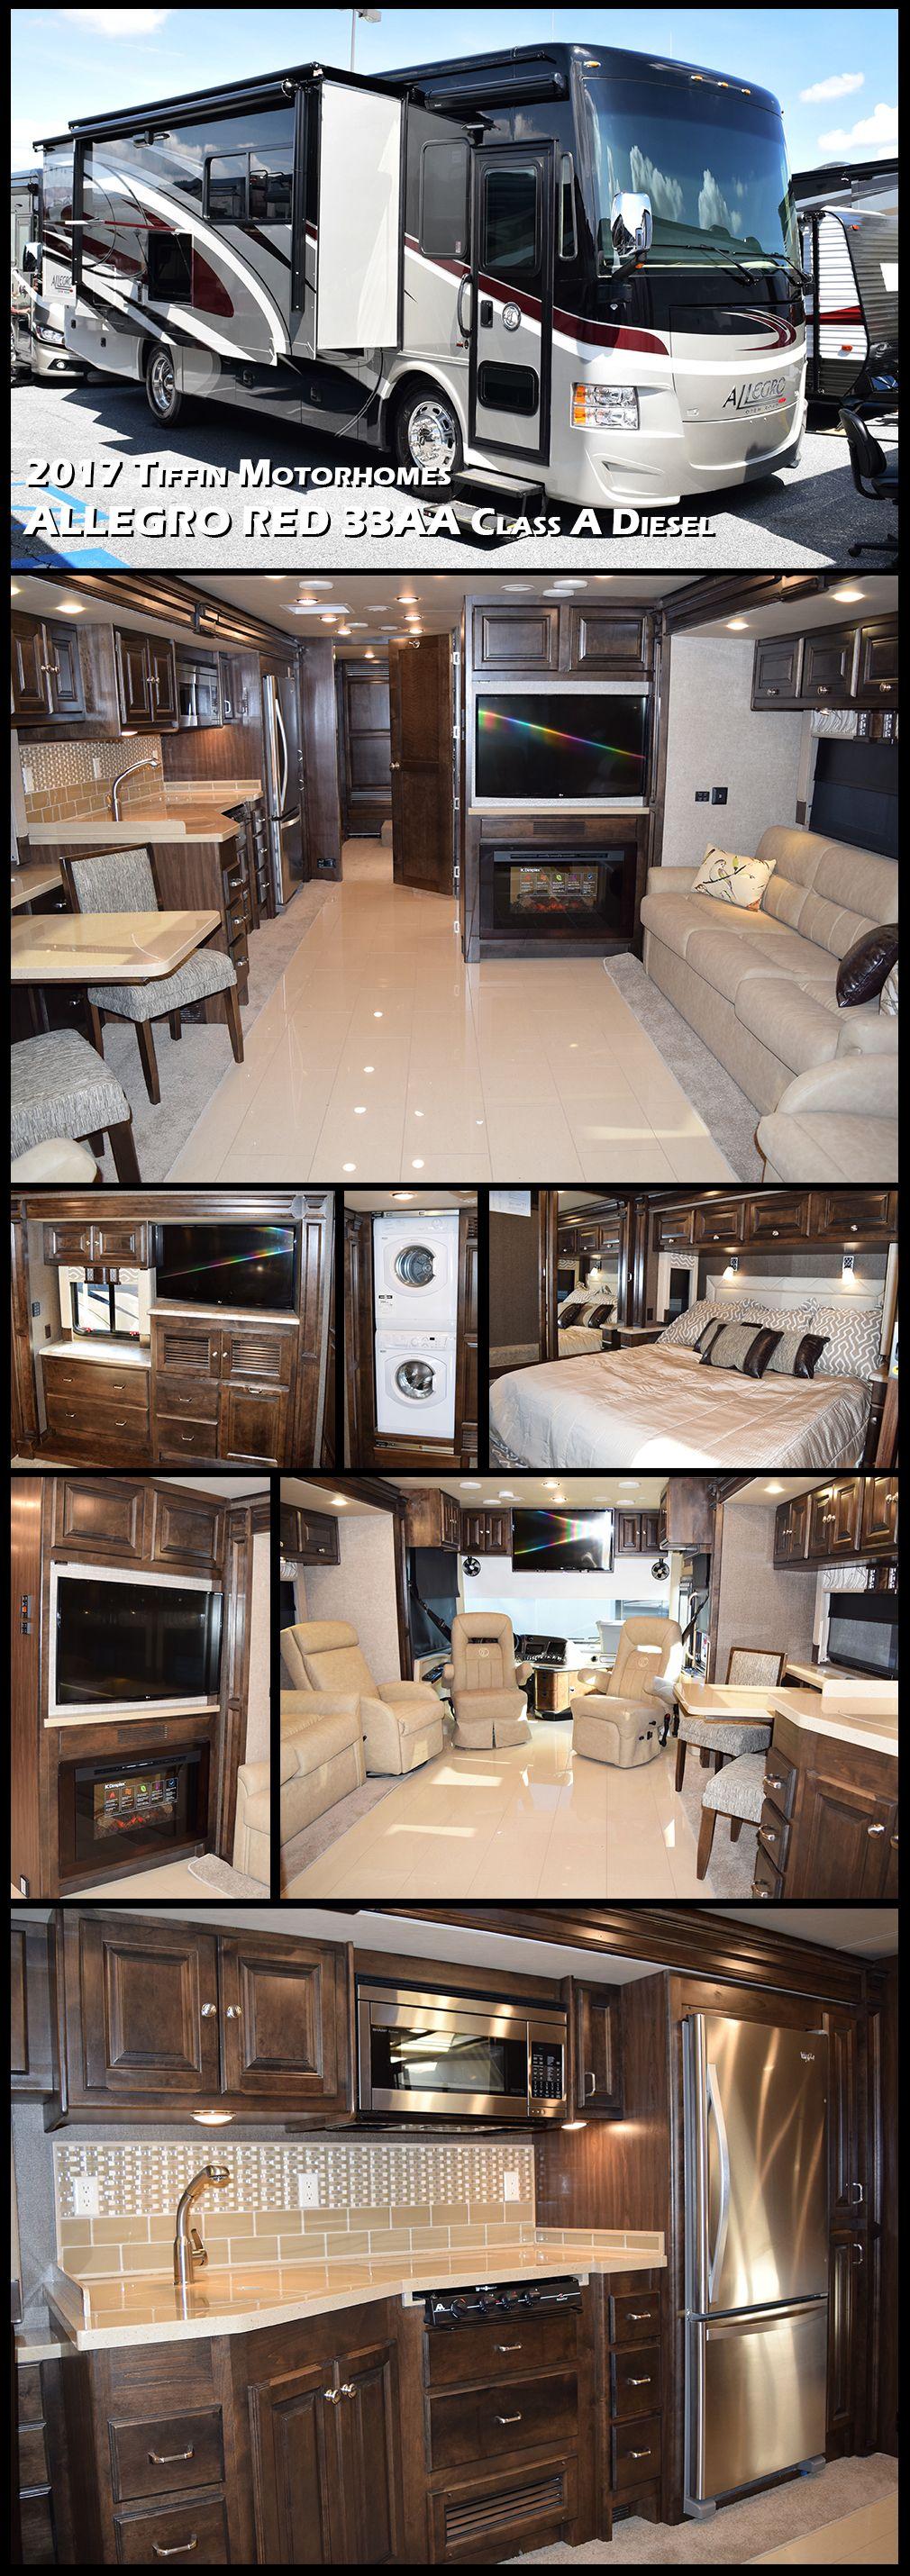 2017 Tiffin Motor Homes Allegro Red M19597 Colton Rv Motorhome Luxury Rv Luxury Motorhomes